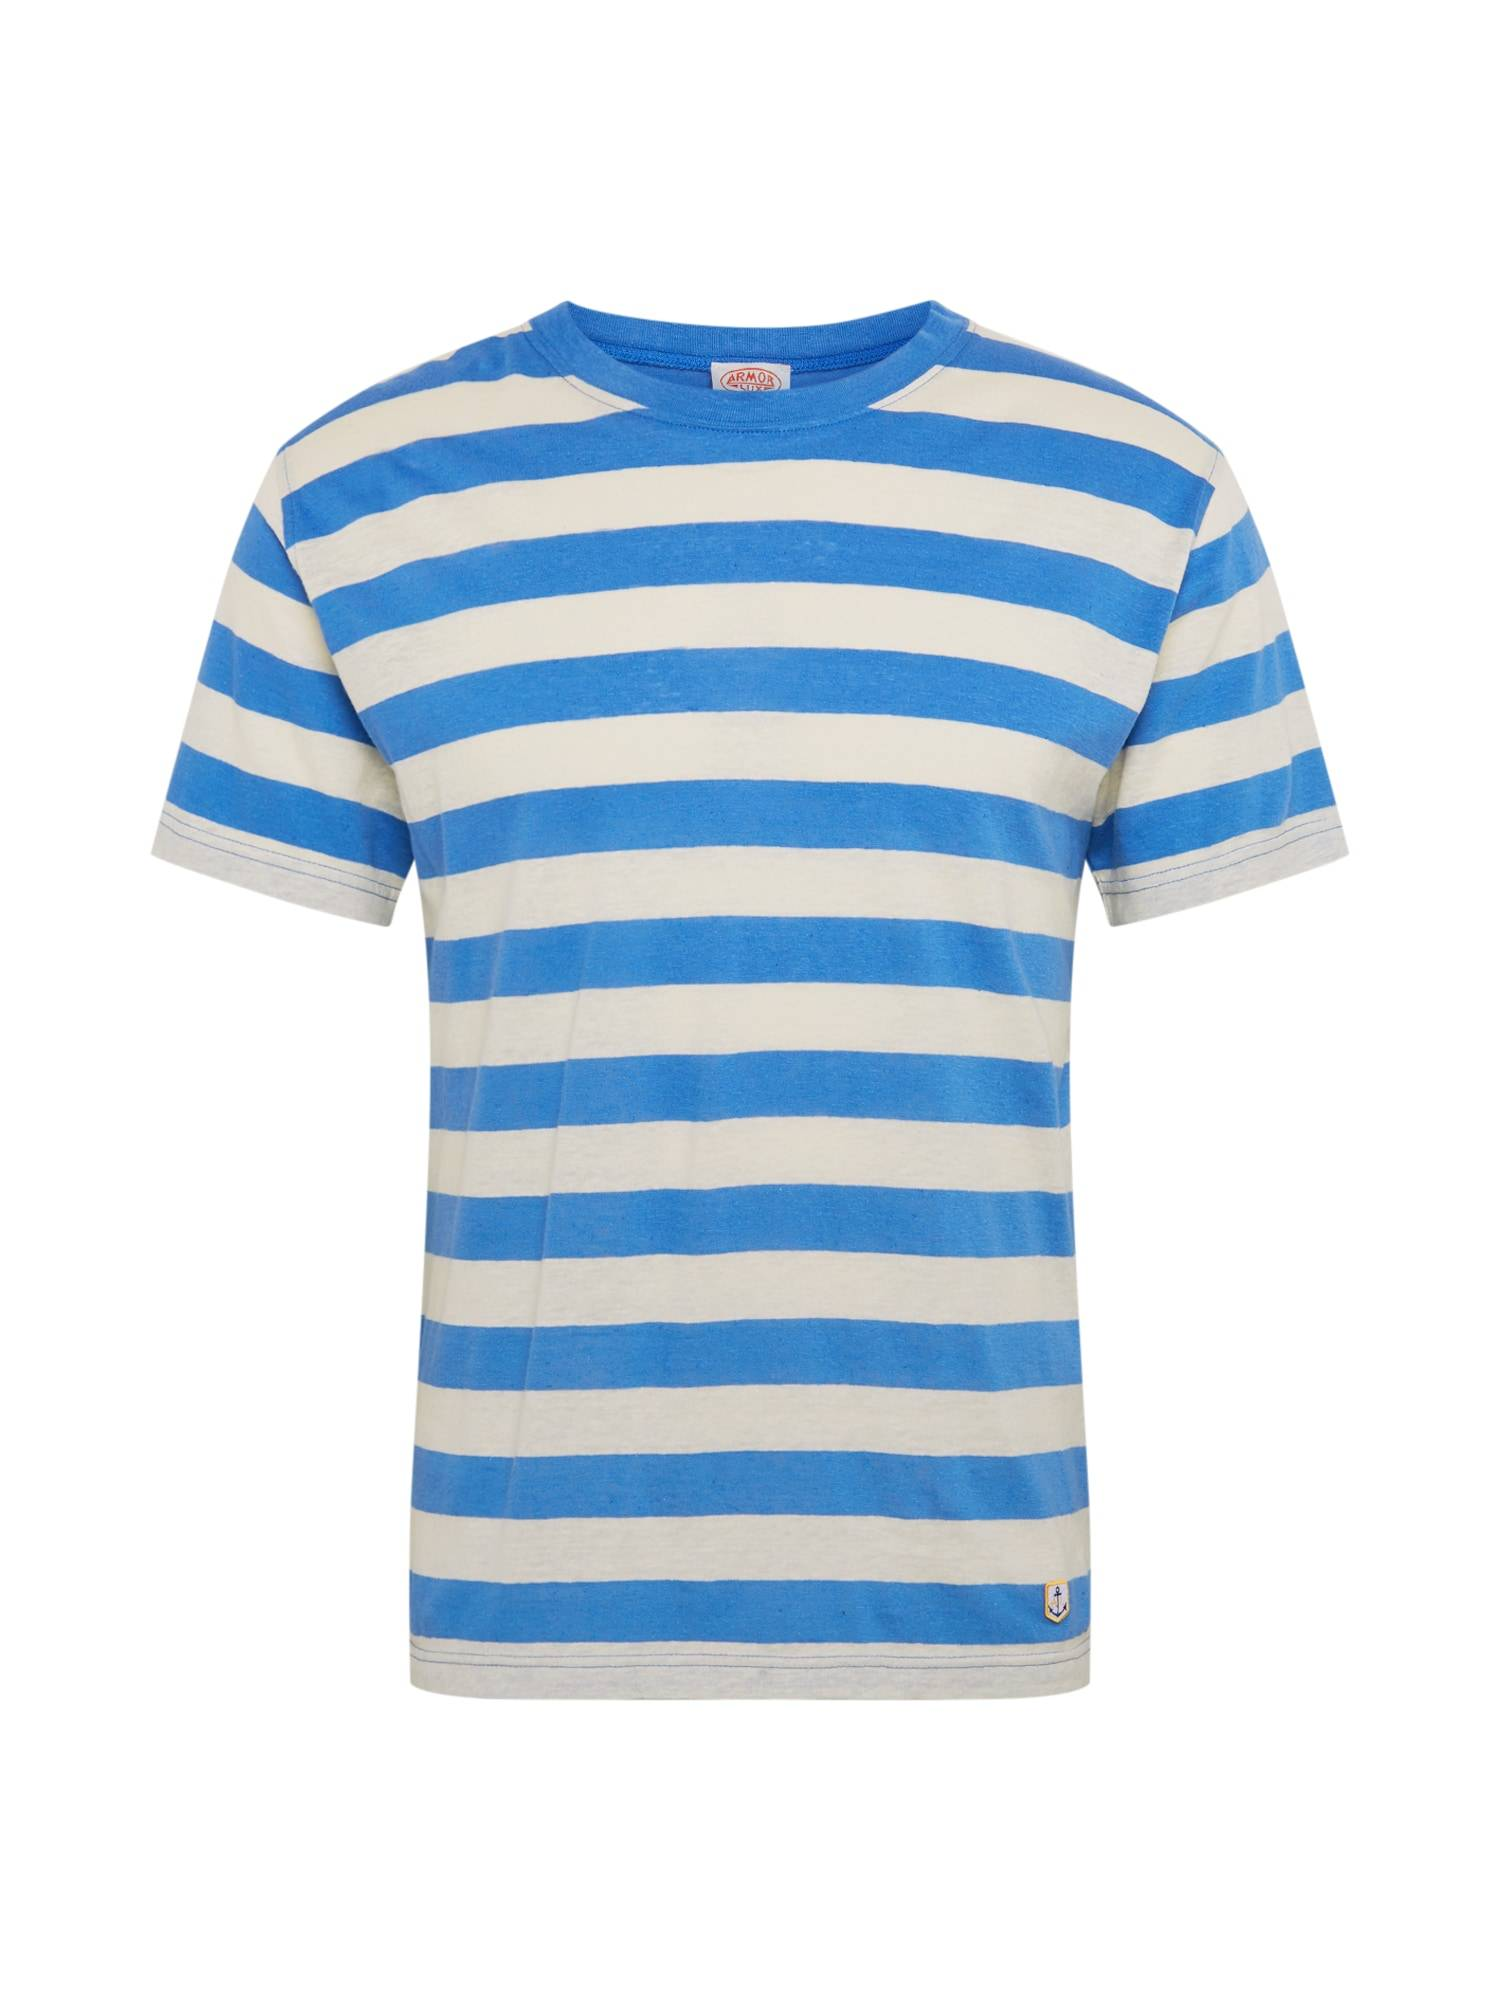 Armor Lux T-Shirt 'Tshirt MC Rayé Héritage'  - Bleu - Taille: S - male